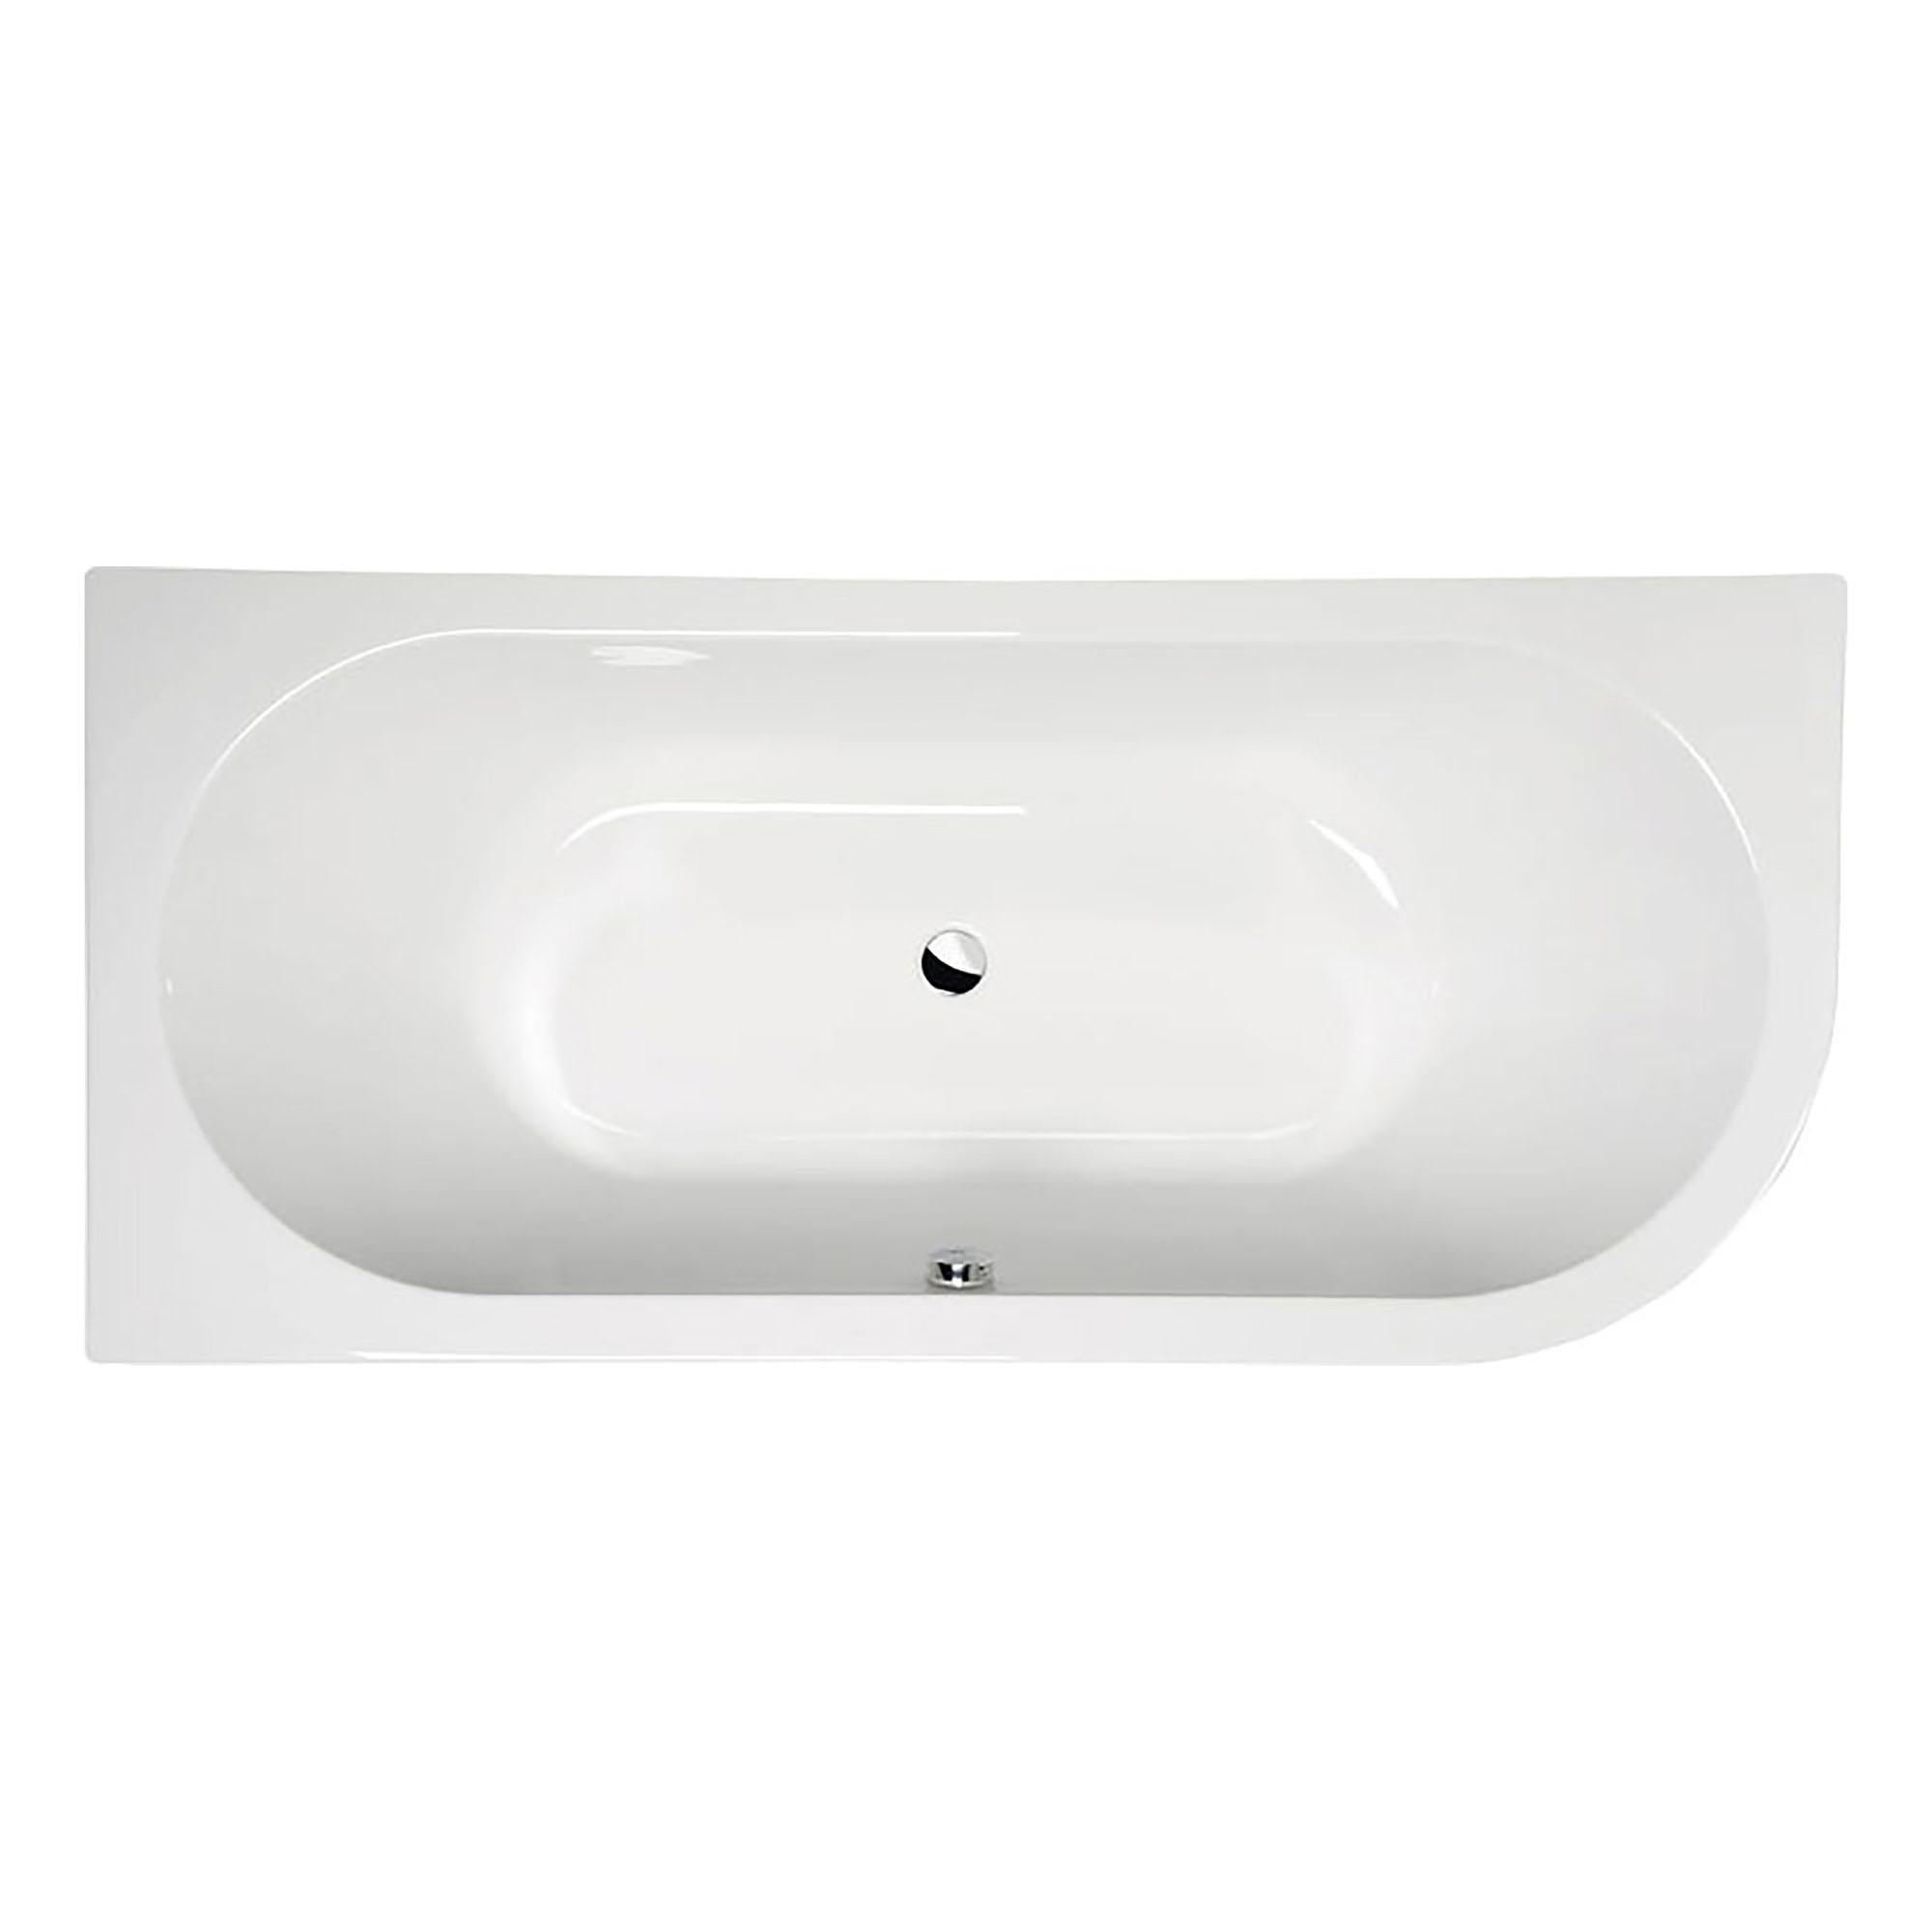 Акриловая ванна Alpen Viva 175x80 L акриловая ванна alpen astra 165x80 l